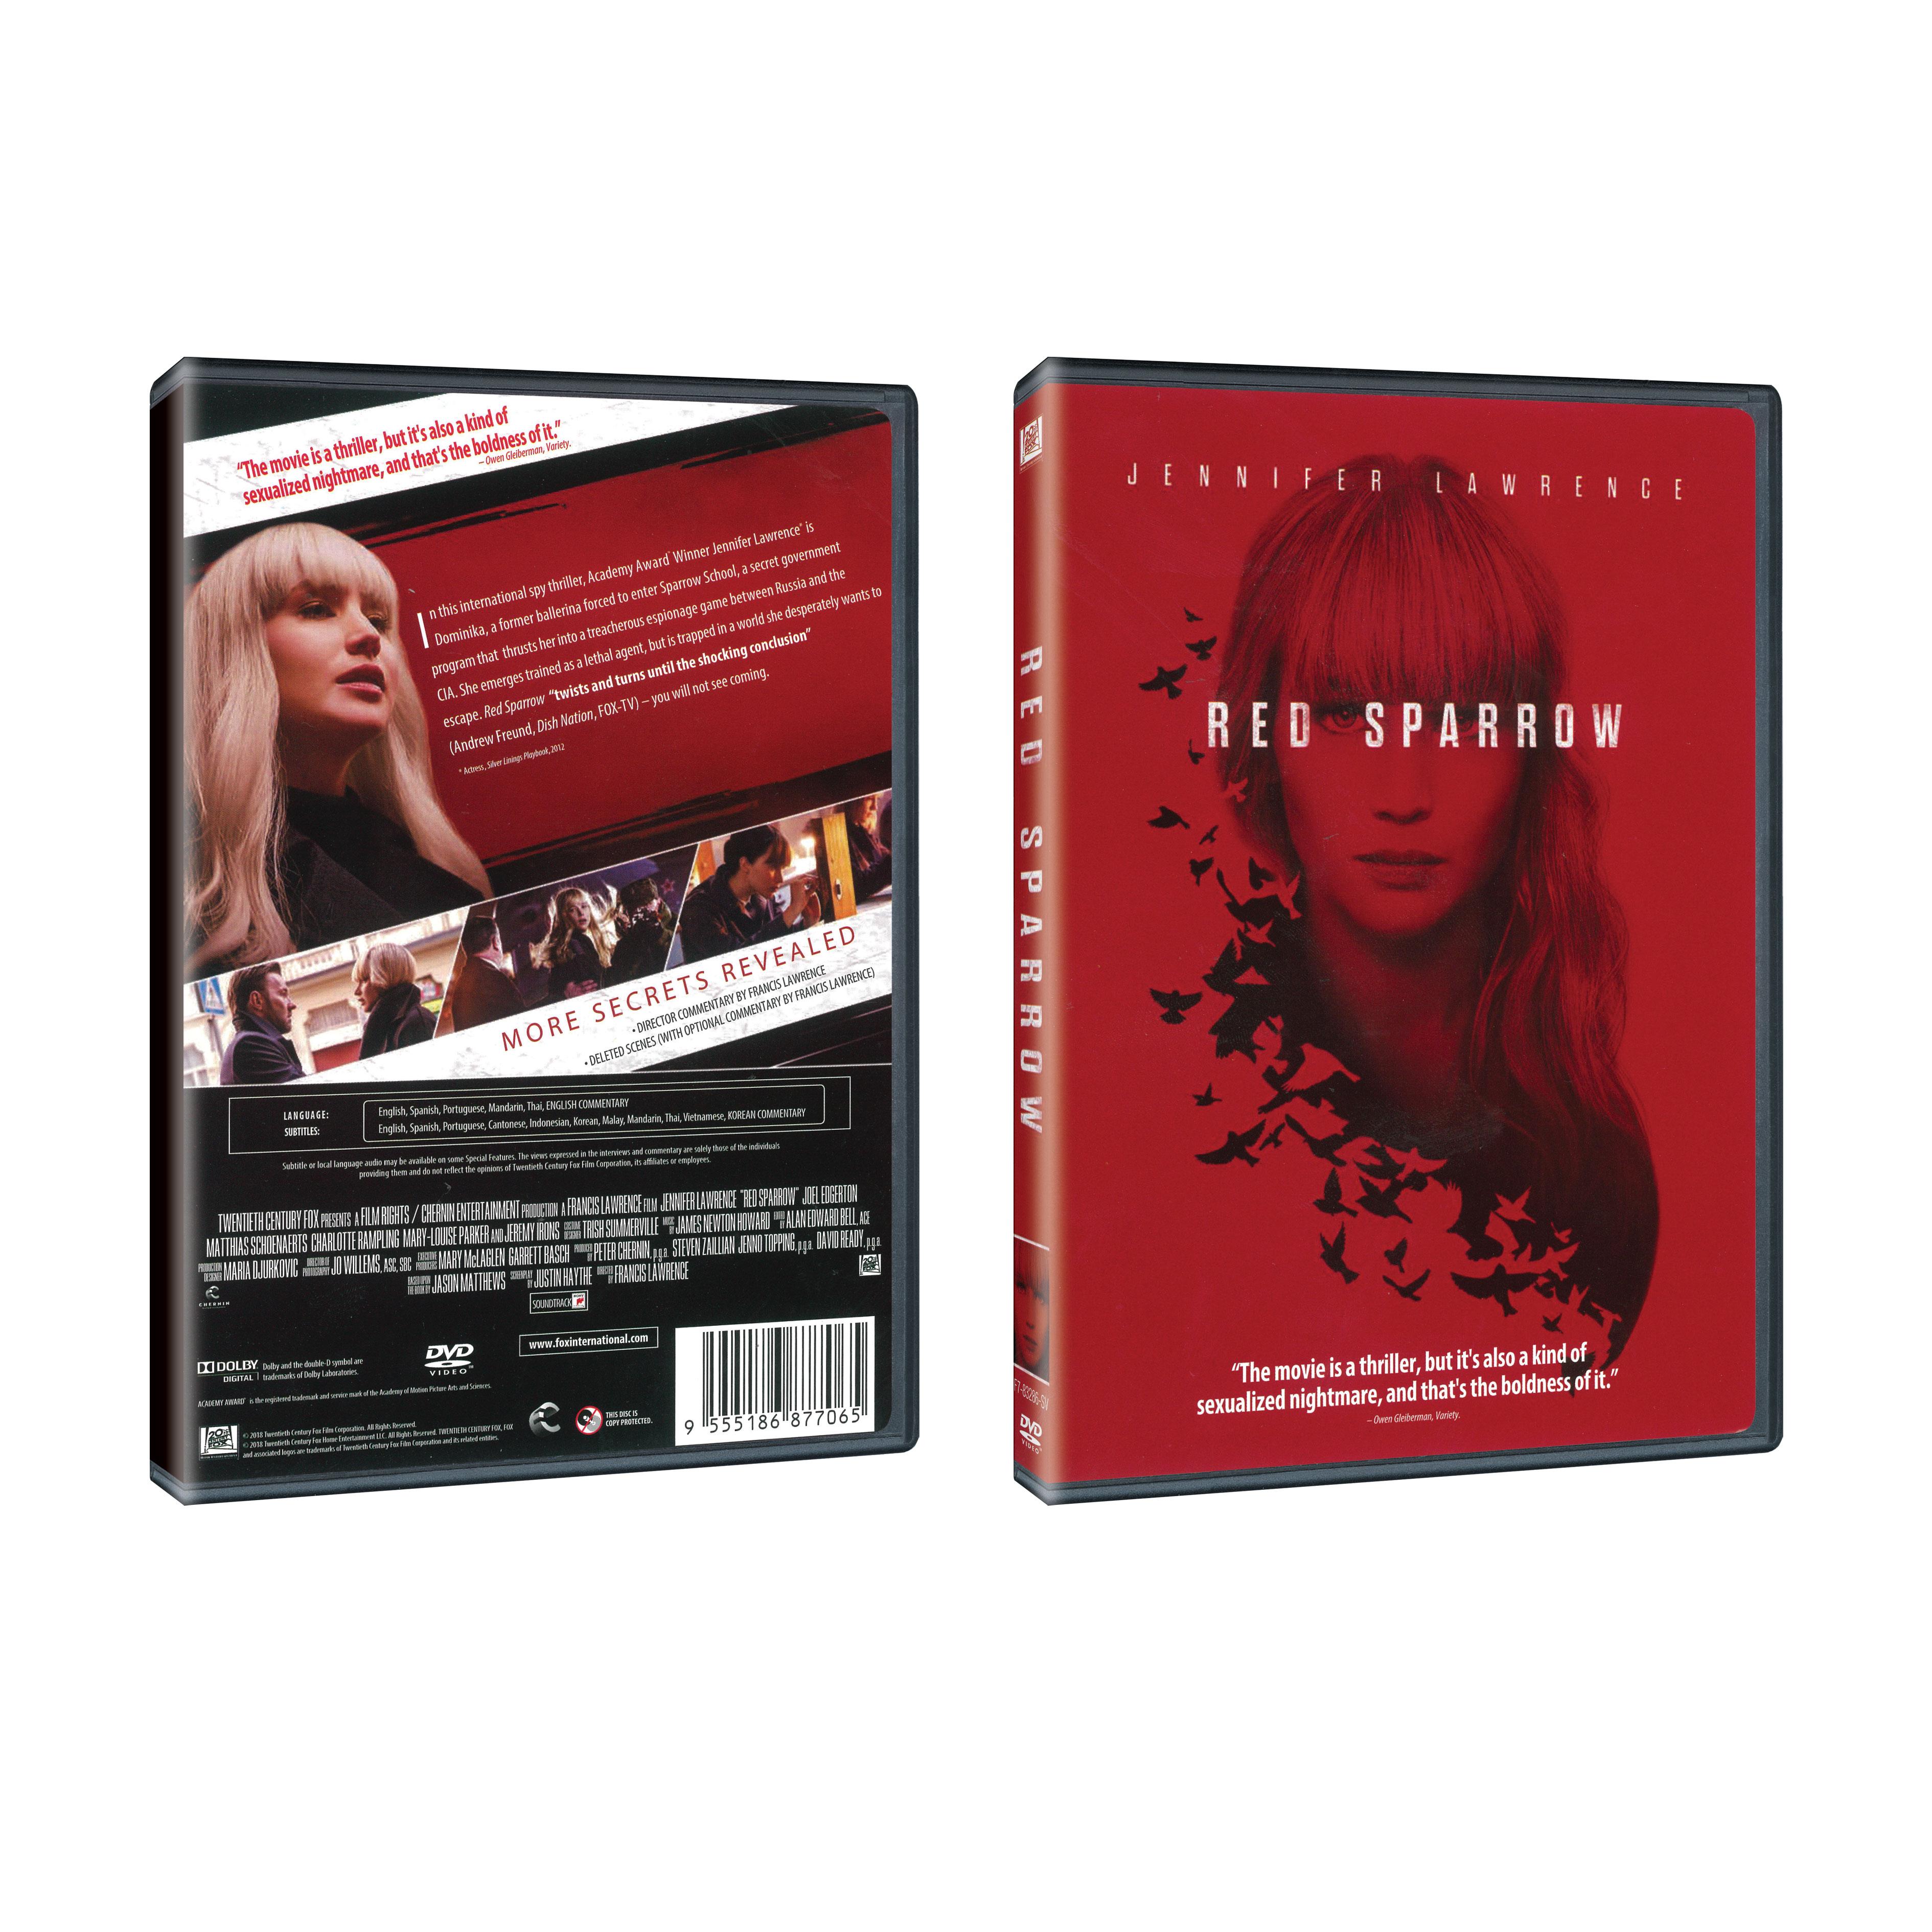 Red Sparrow (DVD) - Poh Kim Video